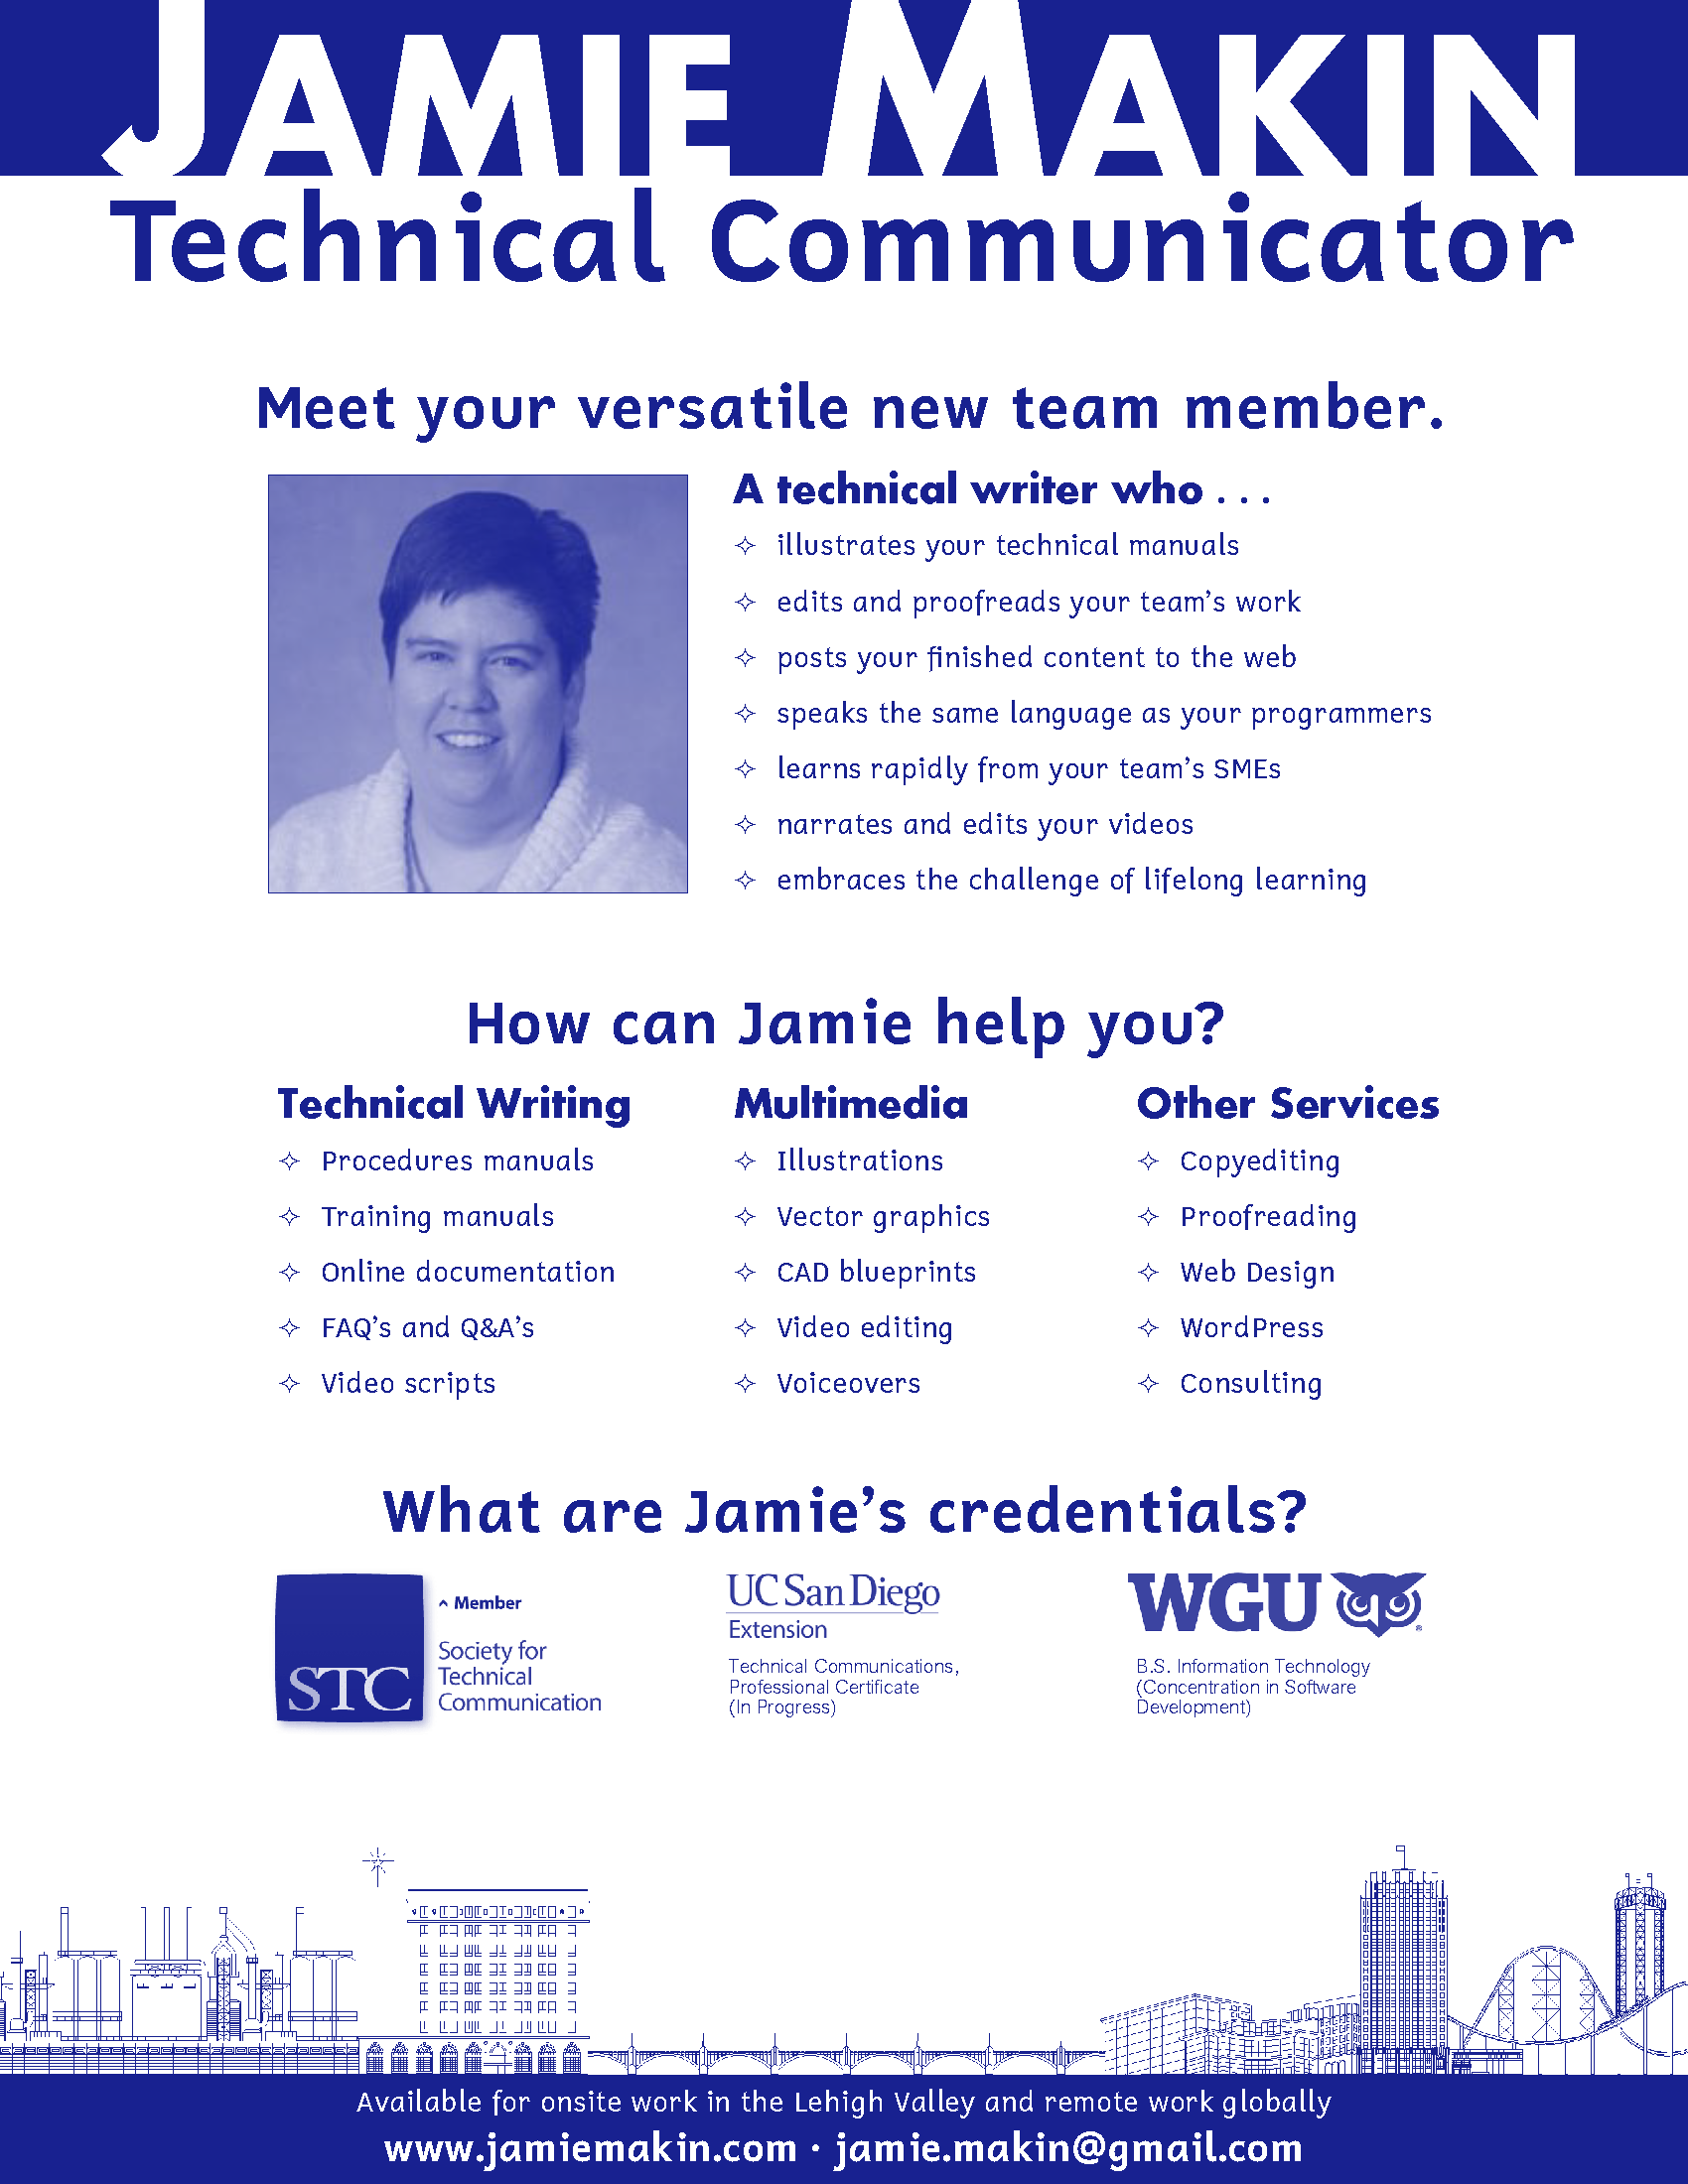 Flyer for Jamie Makin